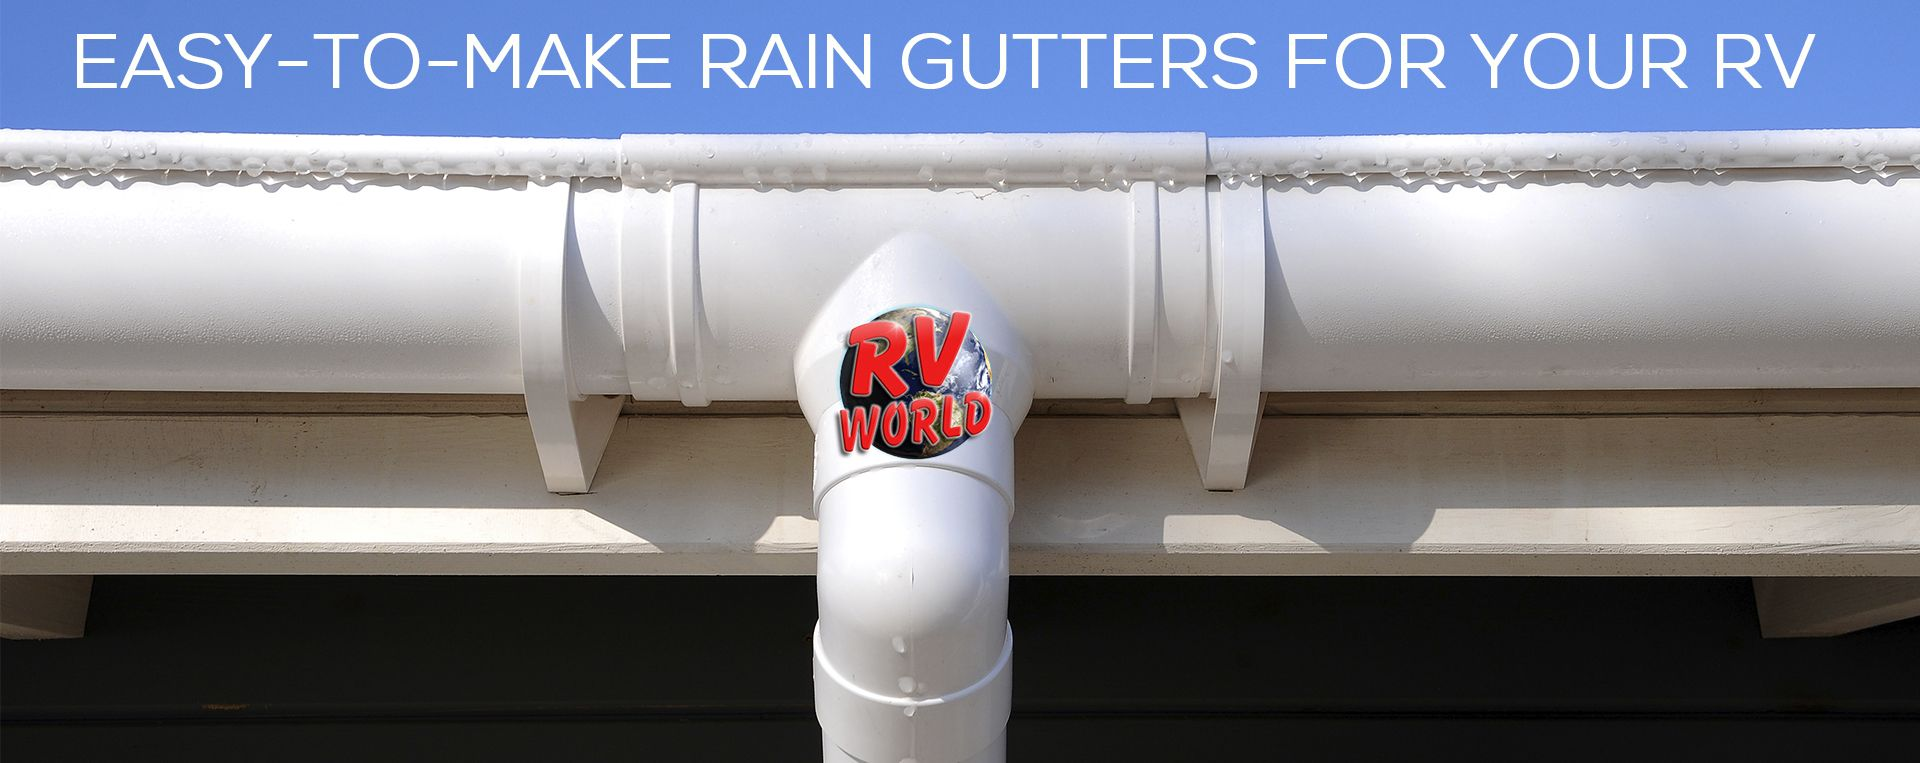 Homemade Diy Rv Rain Gutters Rv World Blog